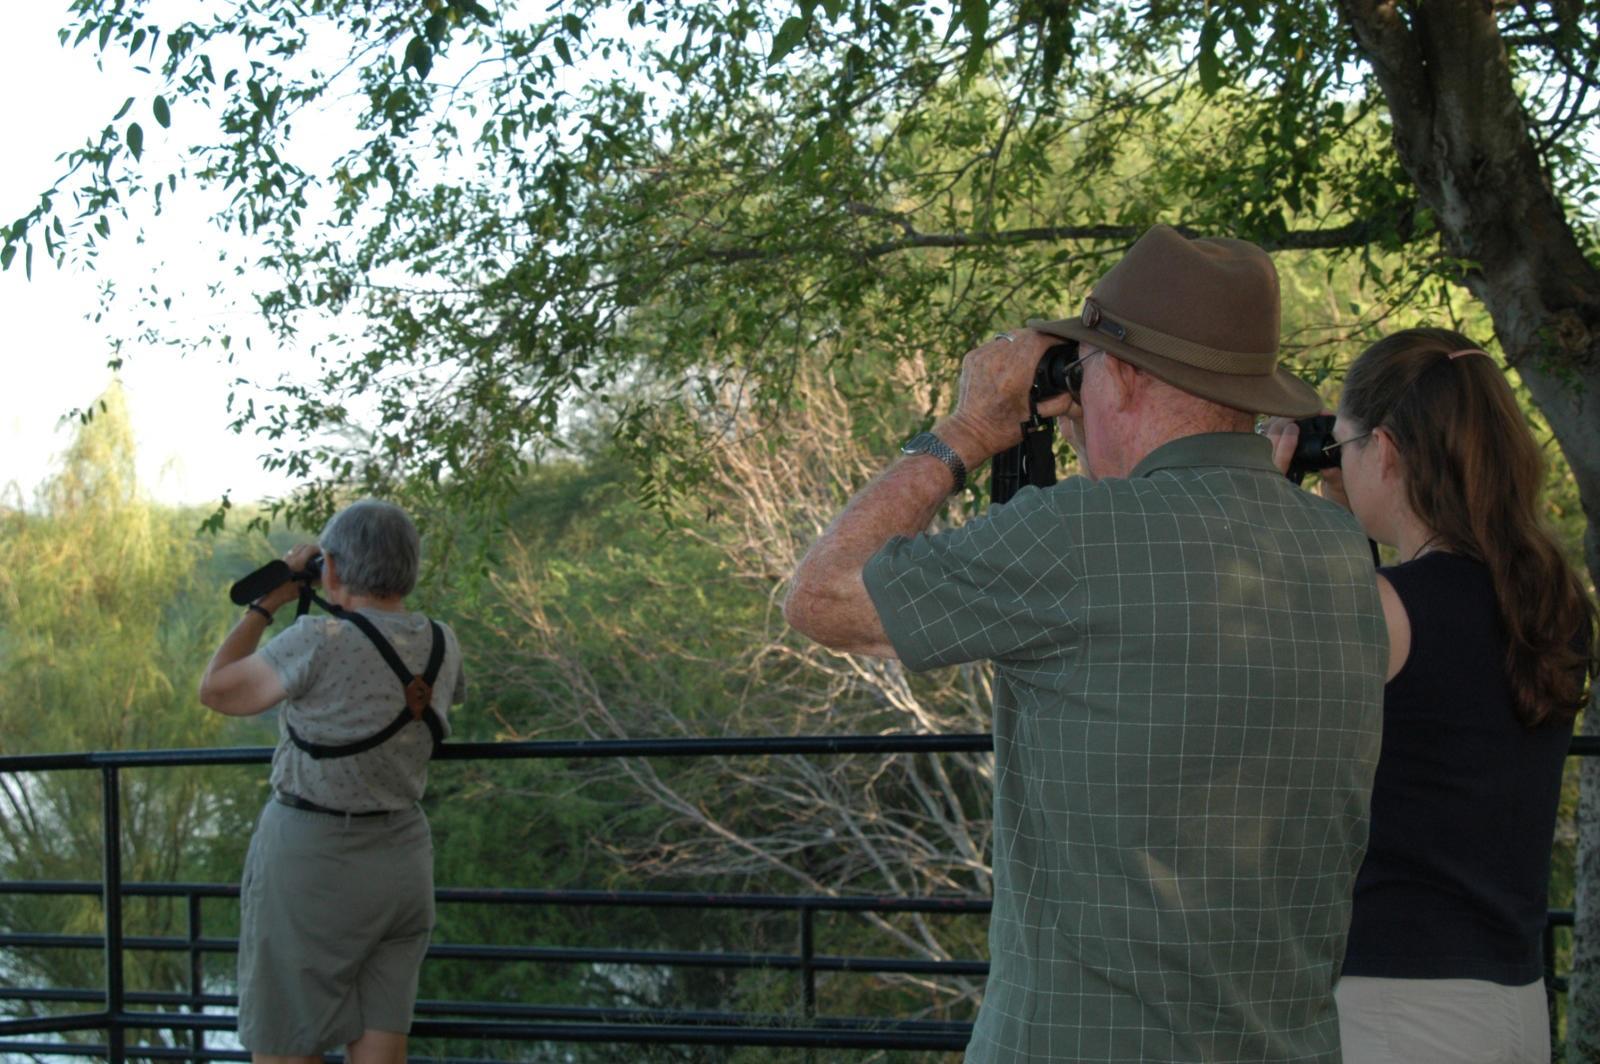 A fine vantage point for birding.